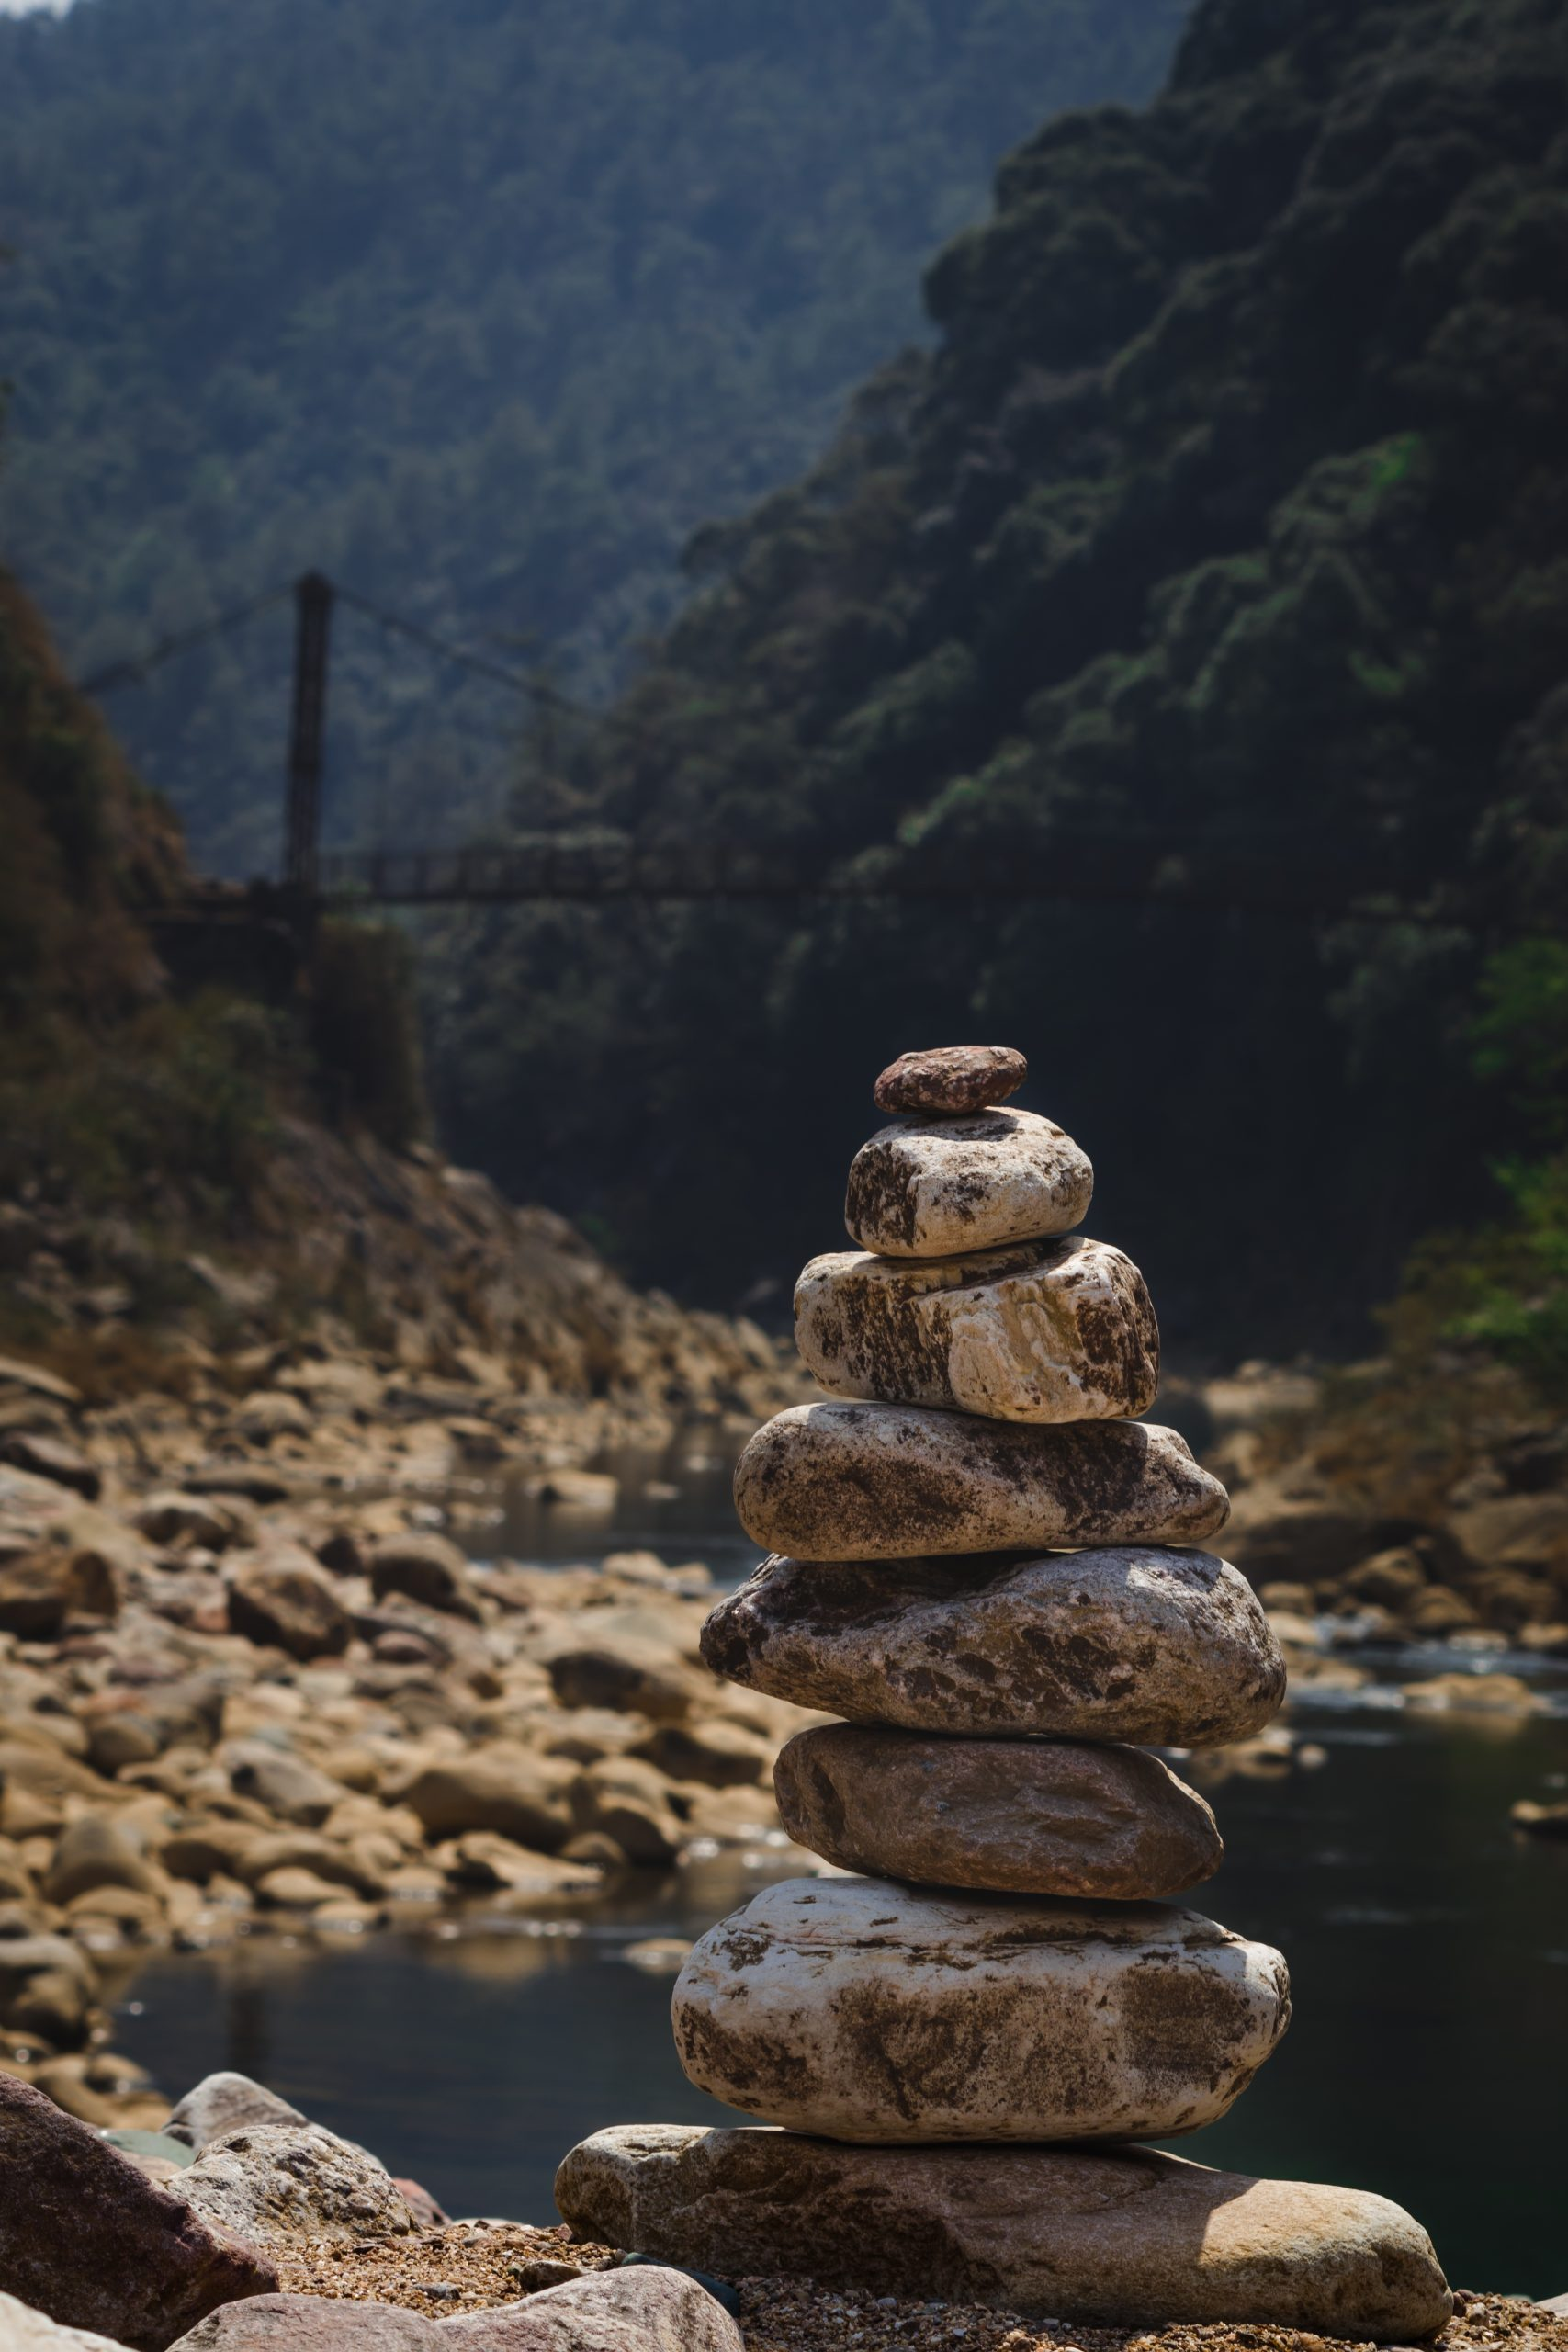 Stones pyramid